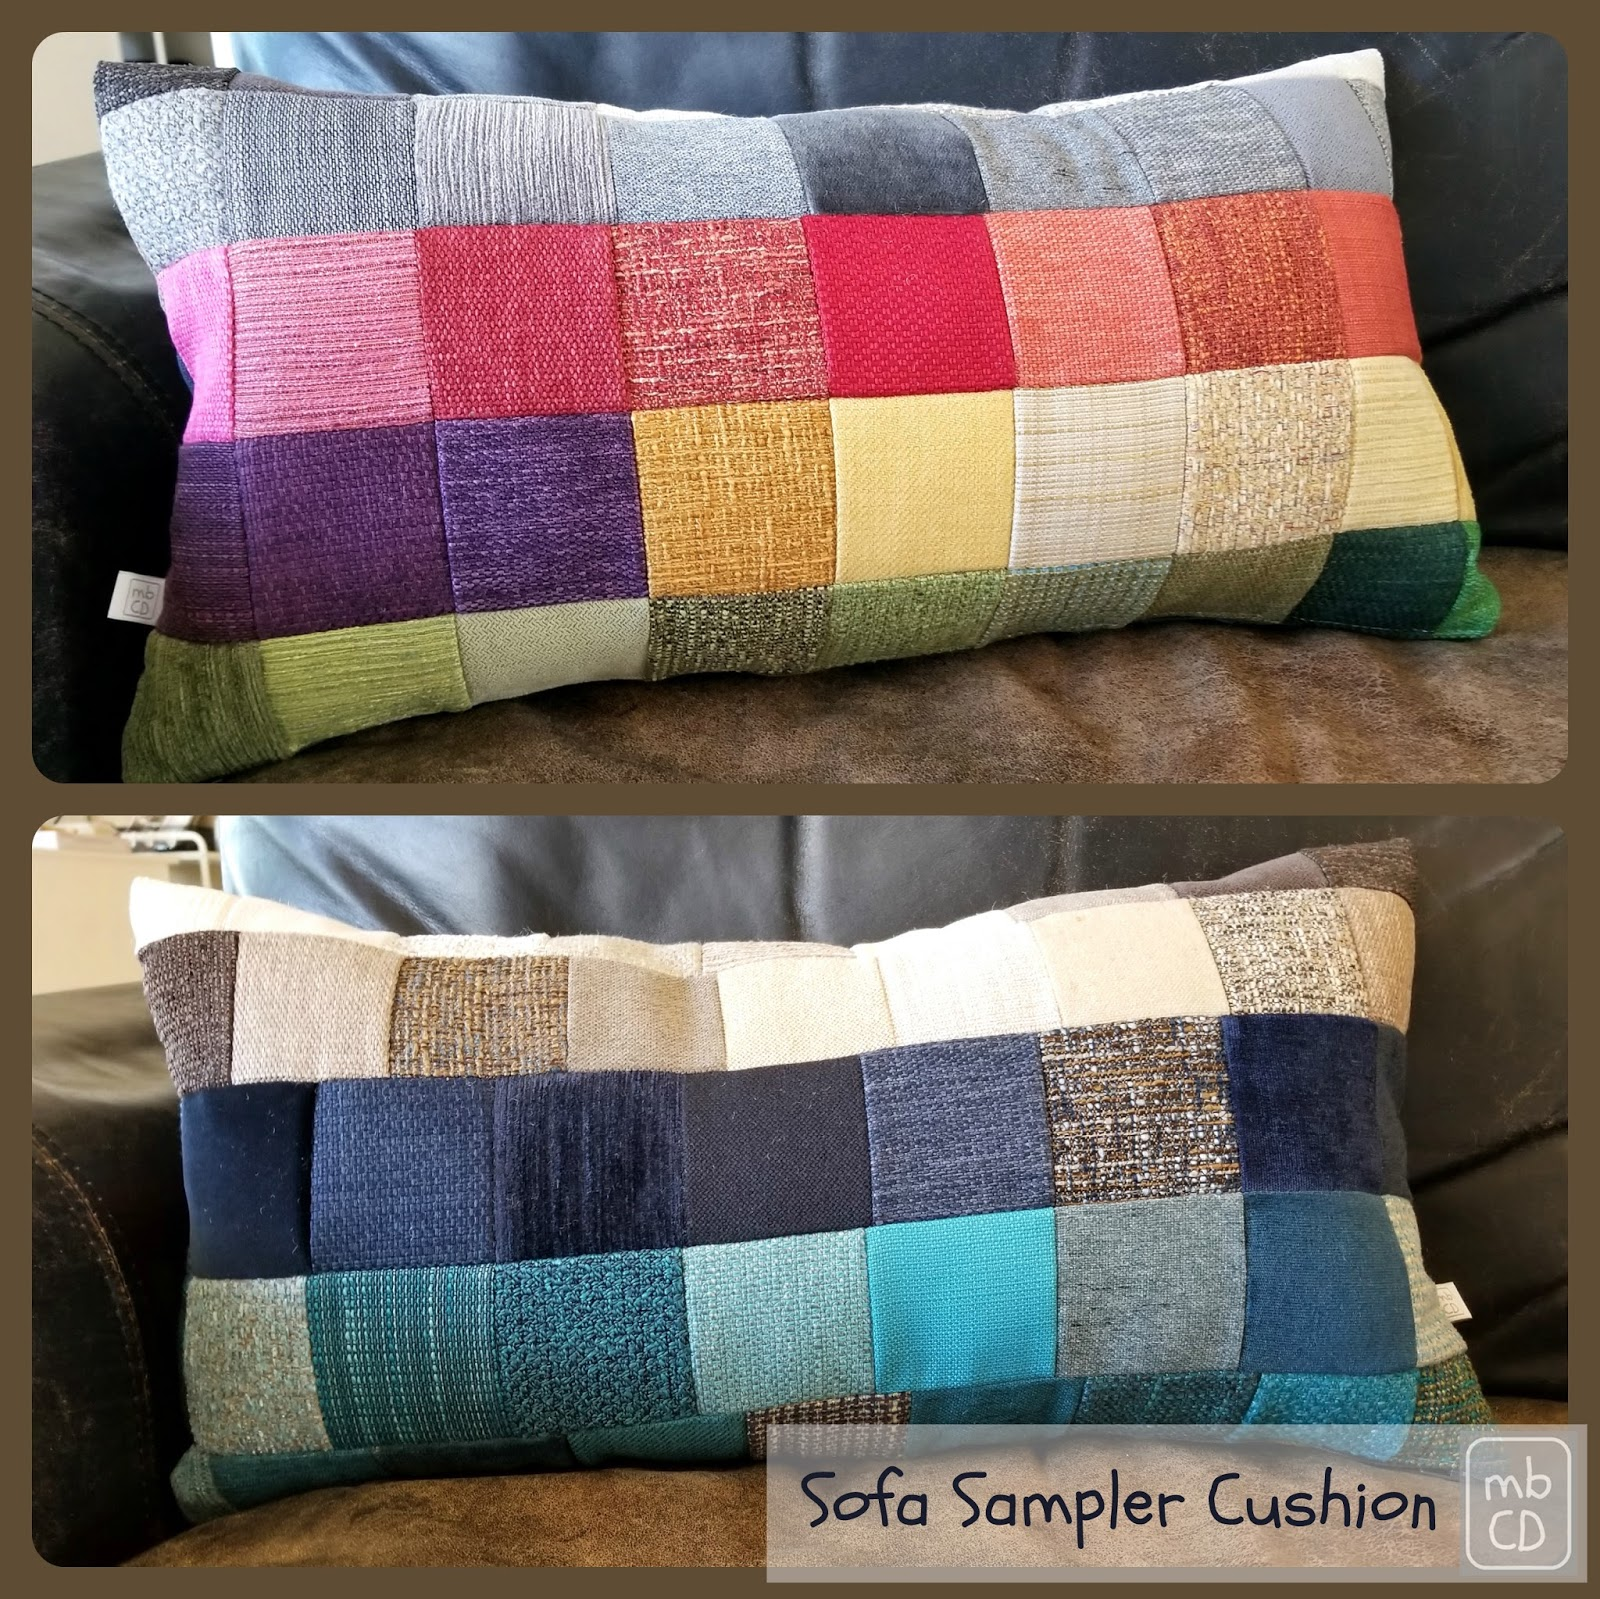 Standard Sofa Cushion Size Best Bed With Sprung Mattress Chris Dodsley Mbcd Sampler